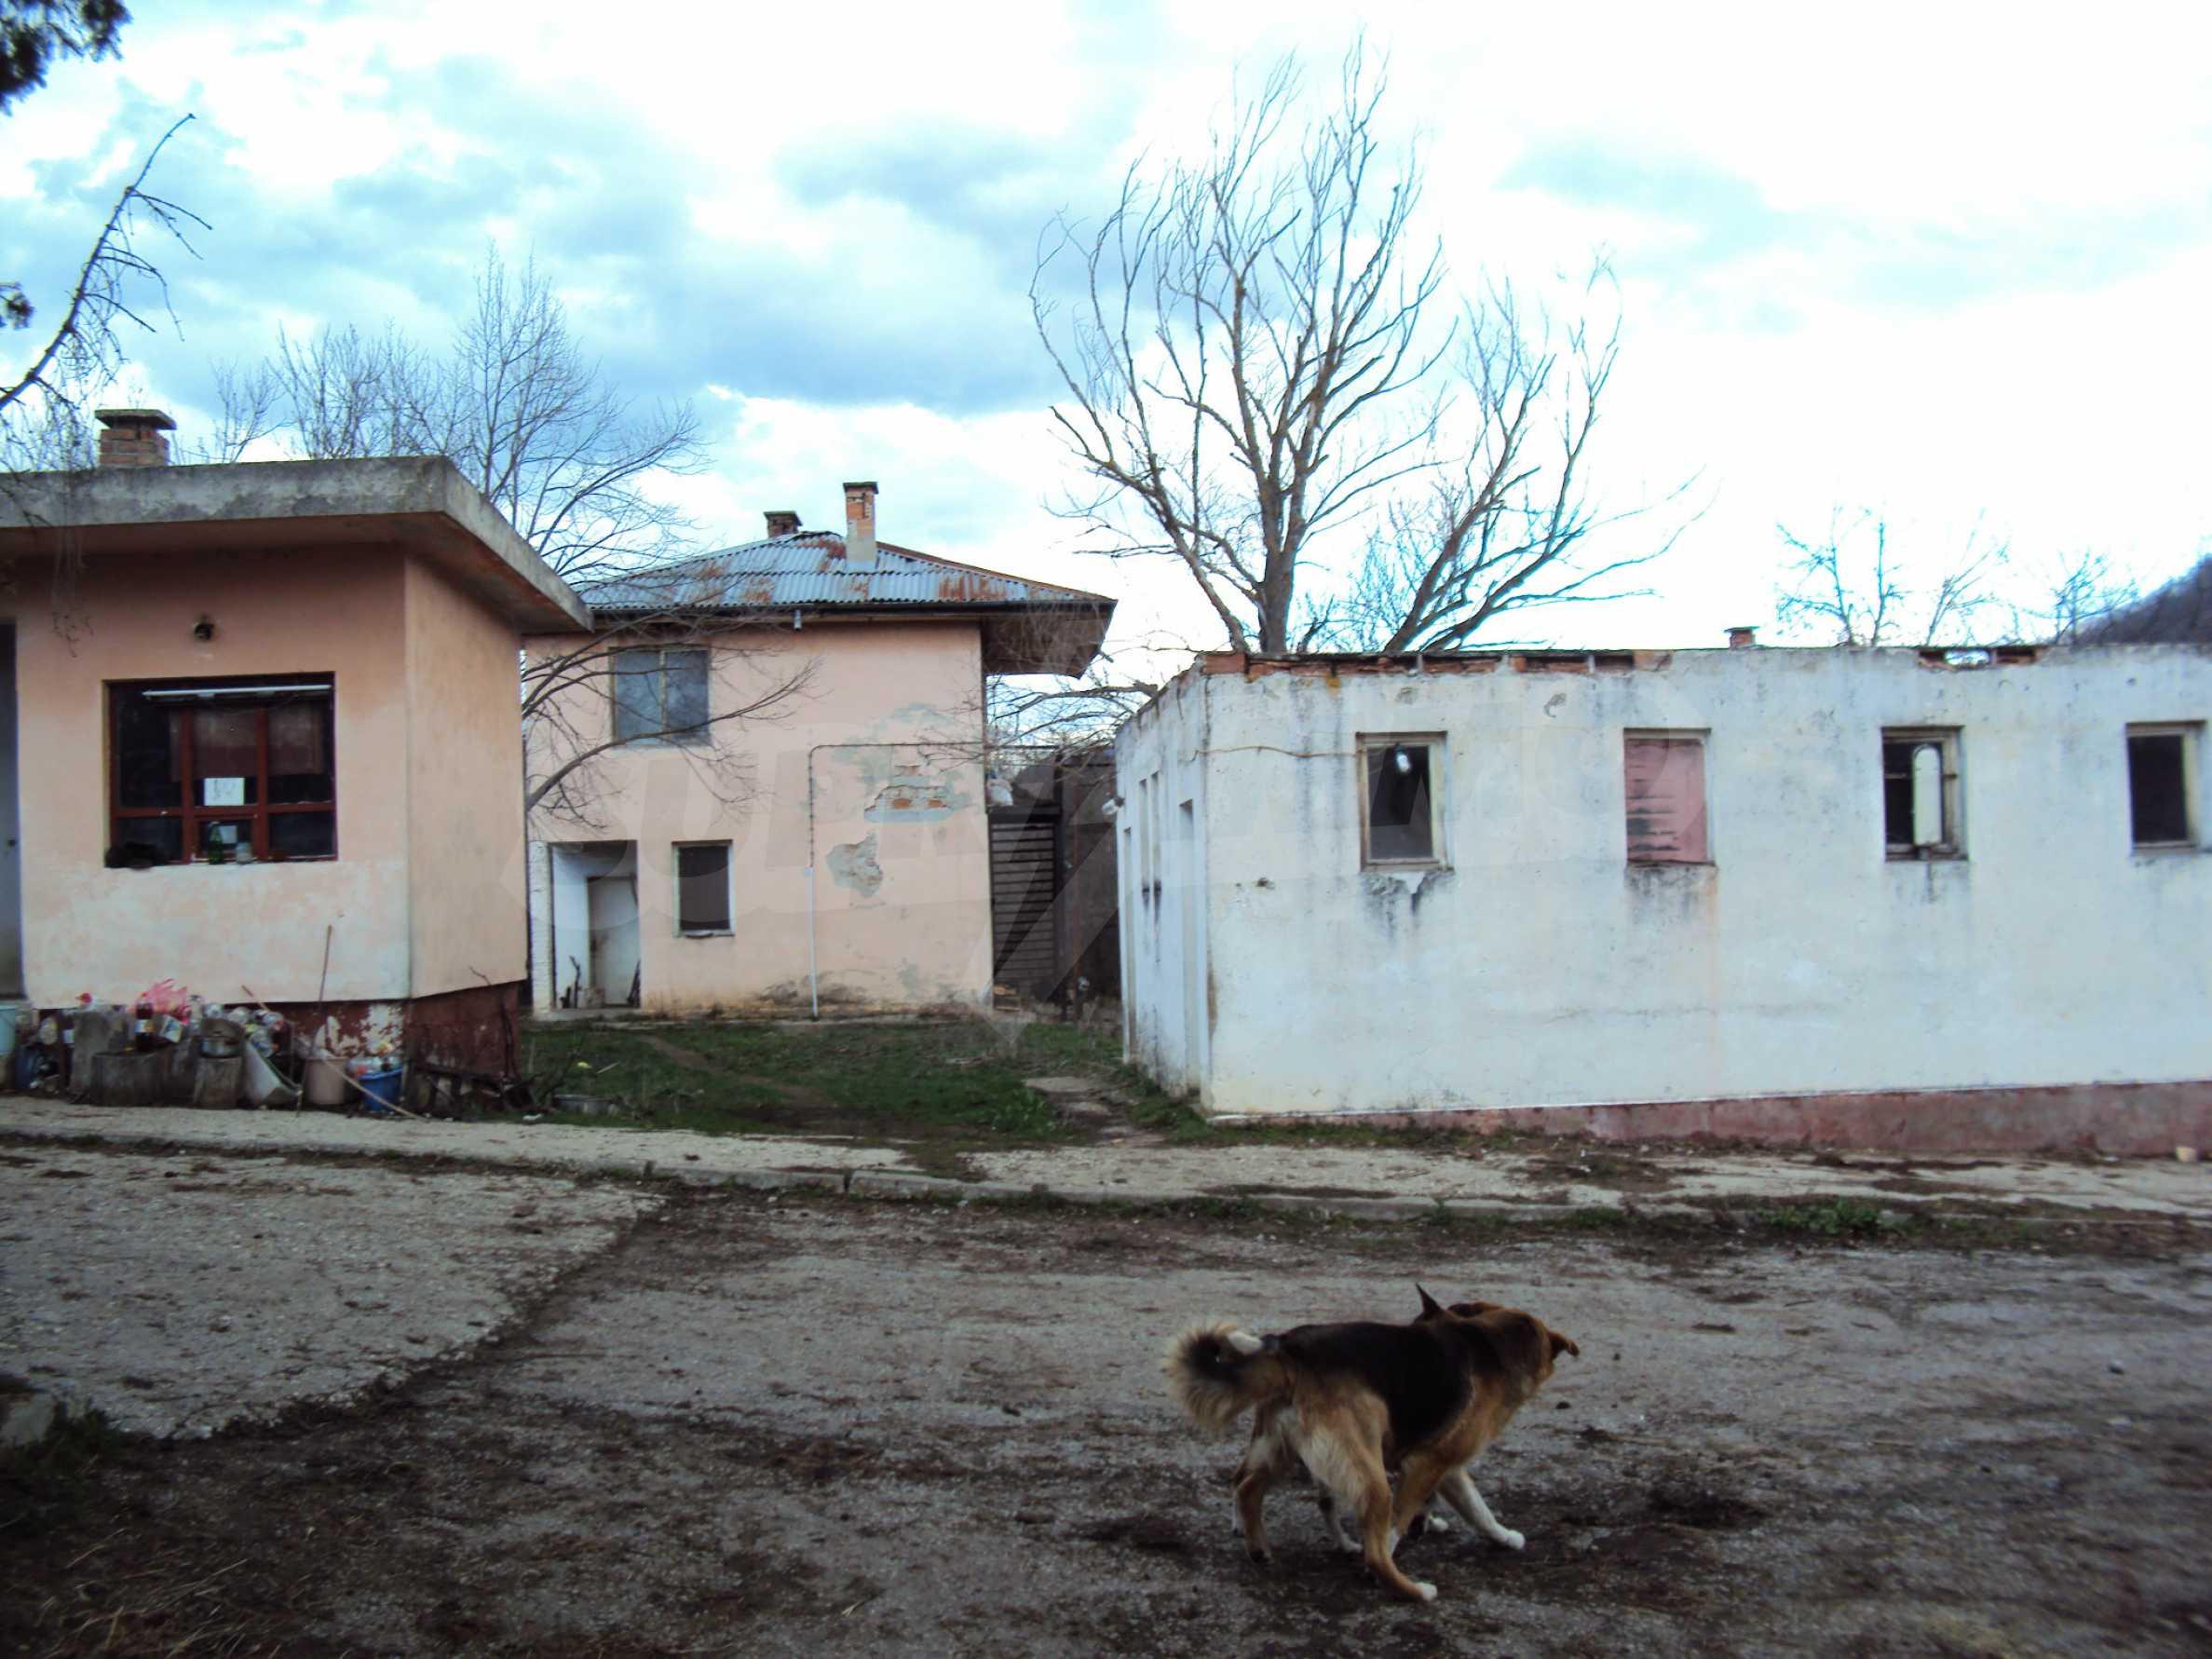 Farm in a small town 24 km from Veliko Tarnovo 6